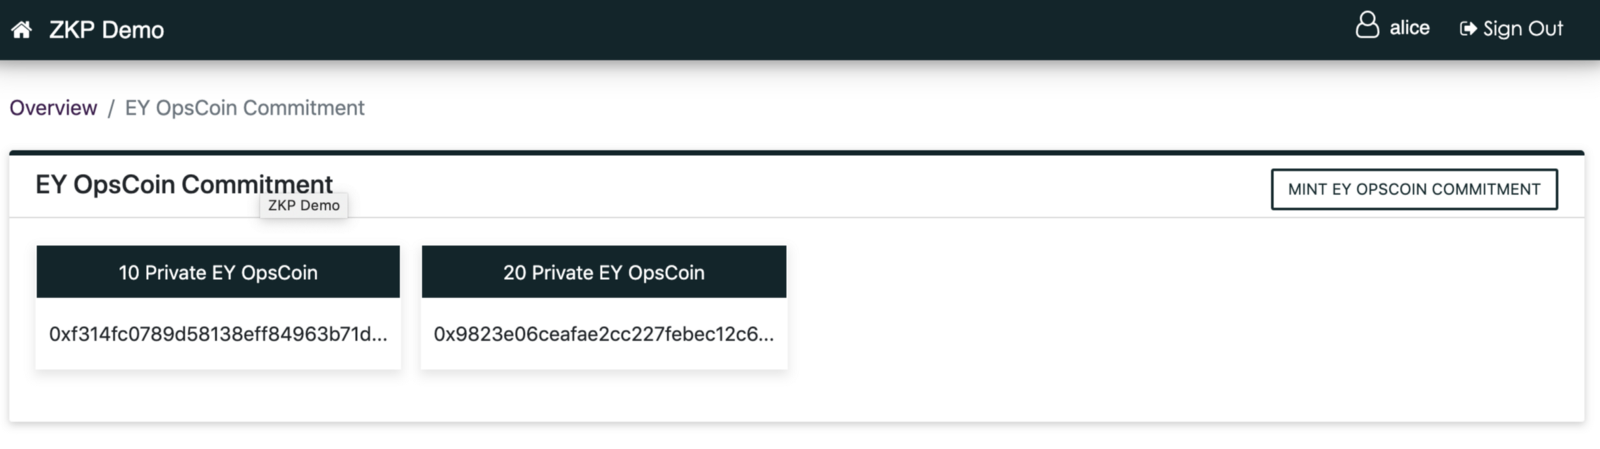 Two OpsCoin token Commitments (hidden tokens)